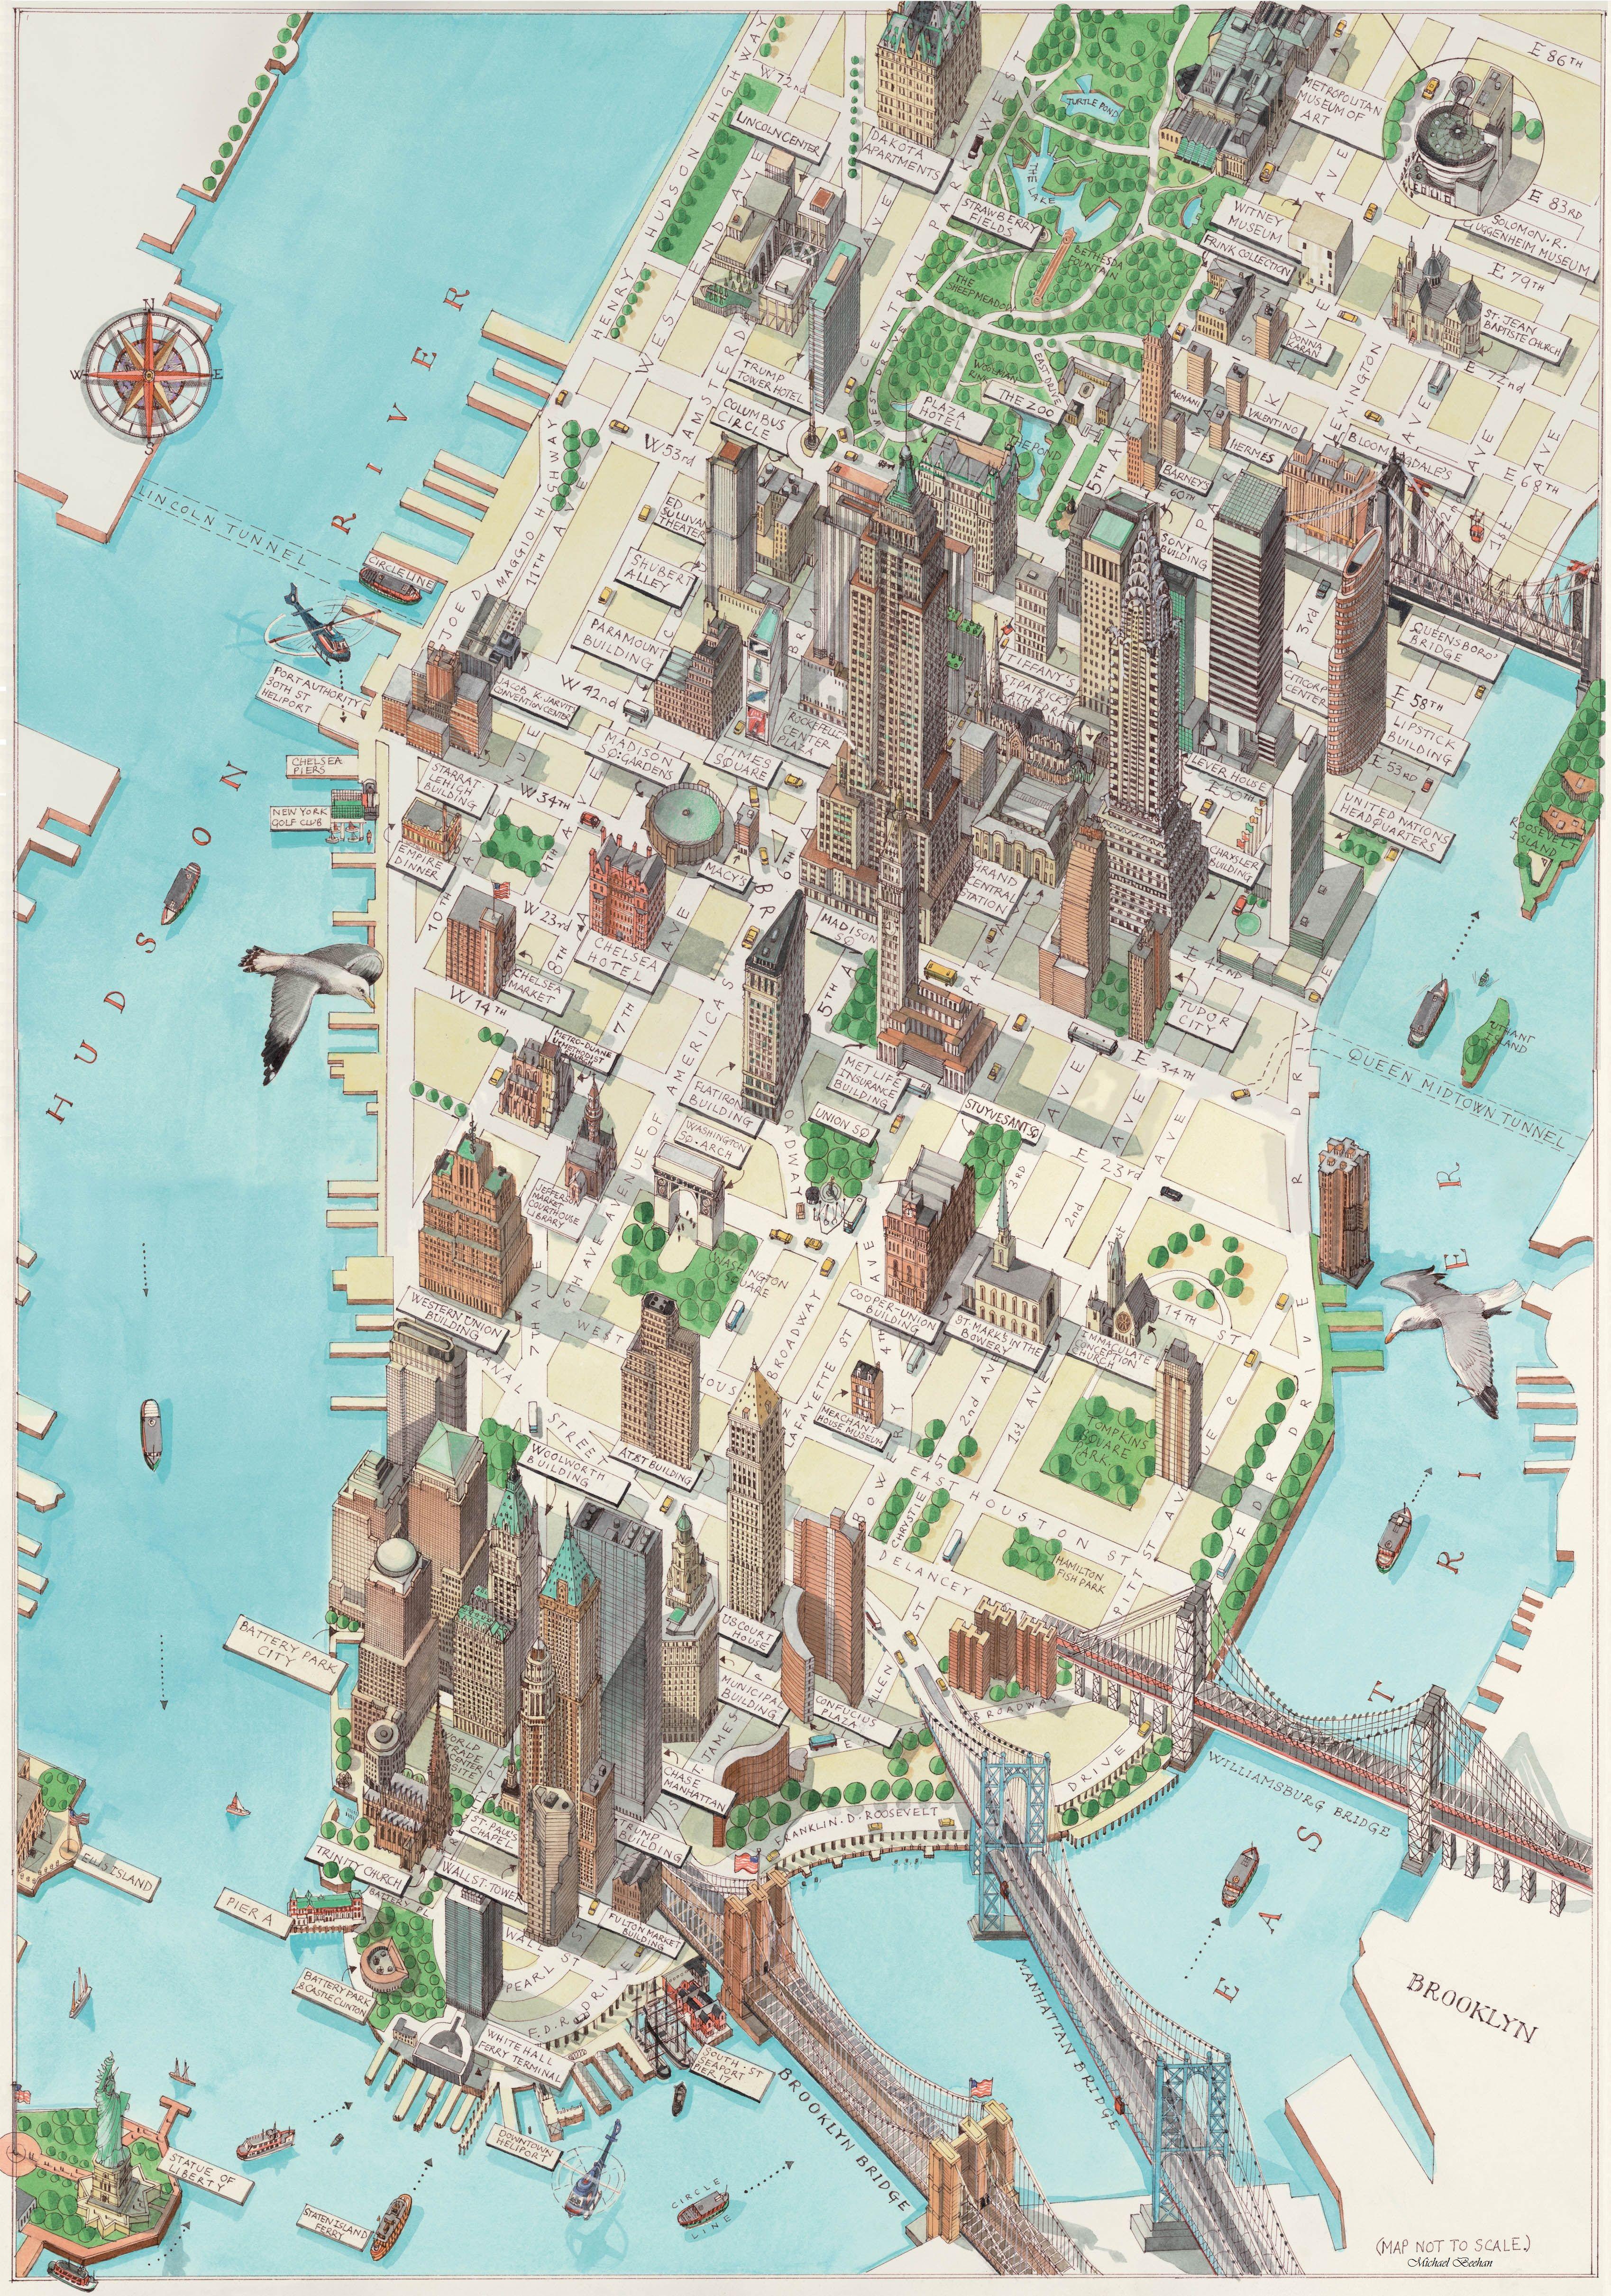 Dpictorialmapnewyorkwellmanhattenmanhattan - Map of new york penn league teams